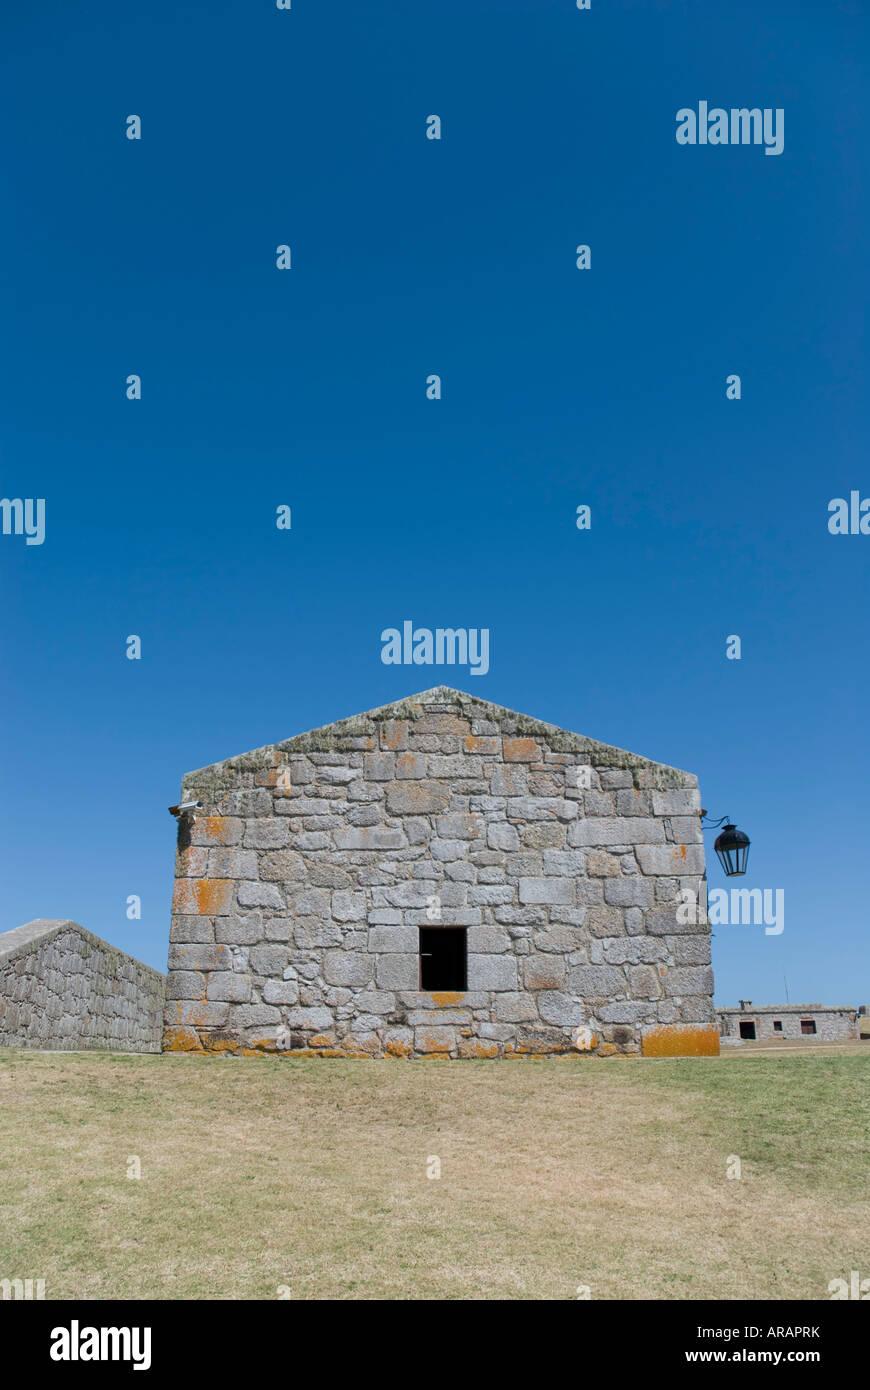 Cropped shot of church inside 'Fortaleza Santa Teresa', Rocha, Uruguay. - Stock Image